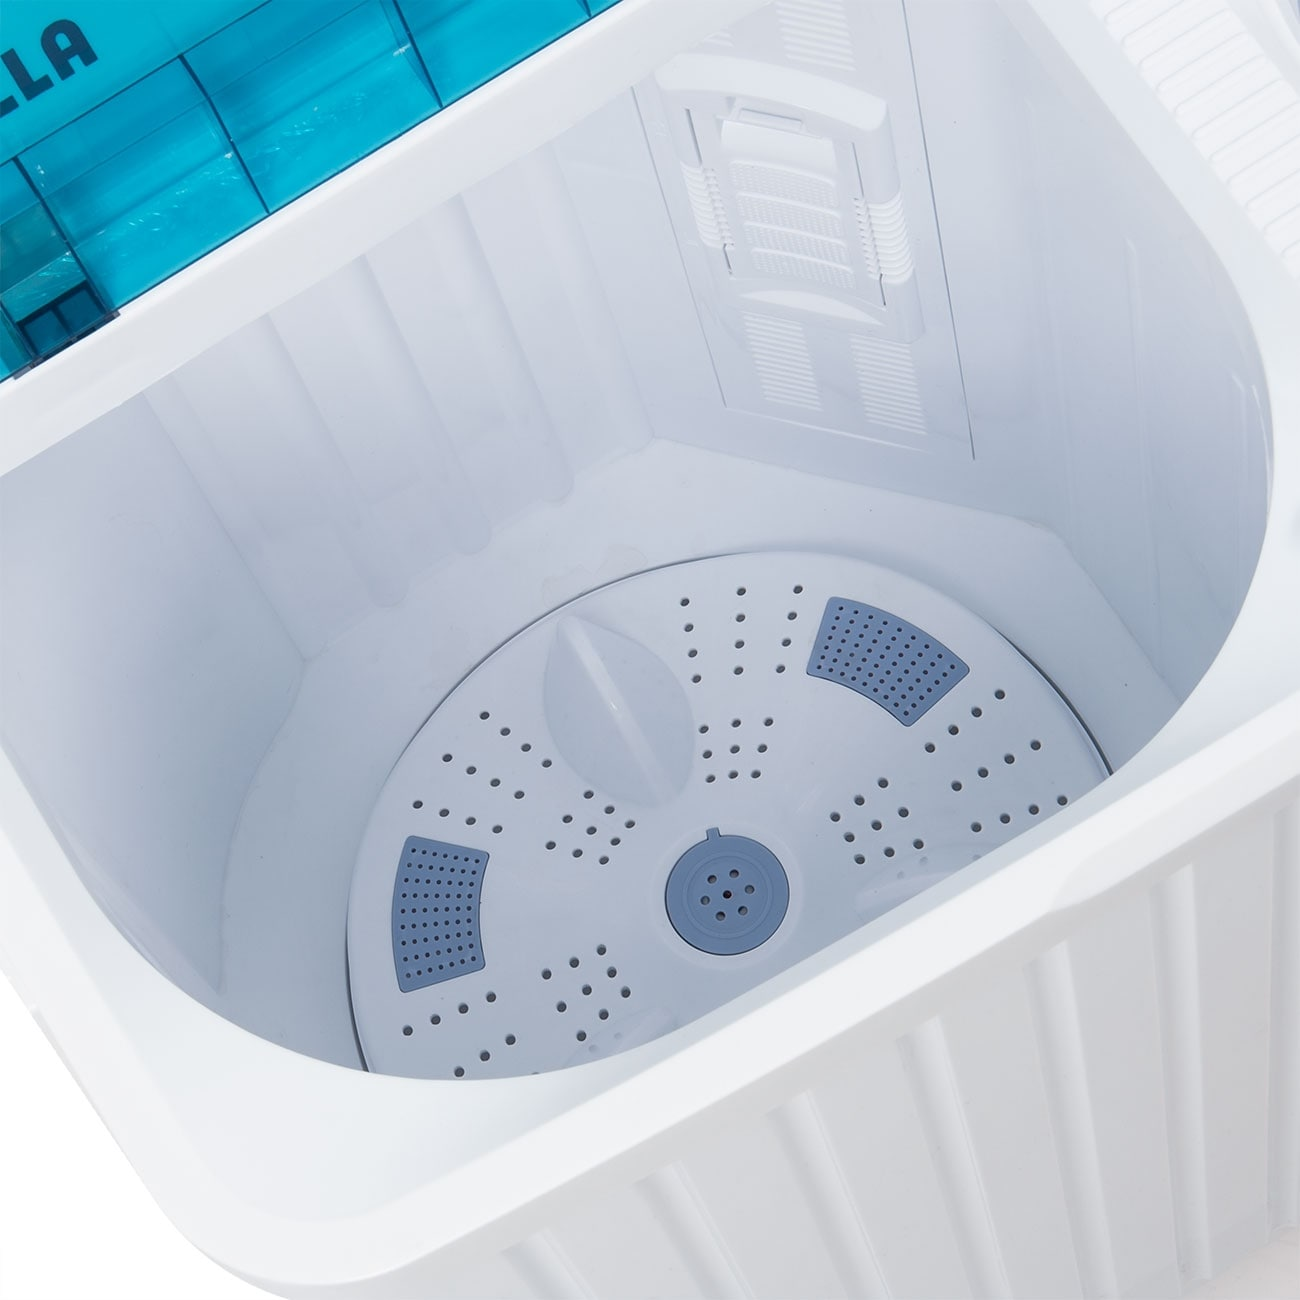 Della Portable Mini Compact Twin Tub Washing Machine Washer Spin ...